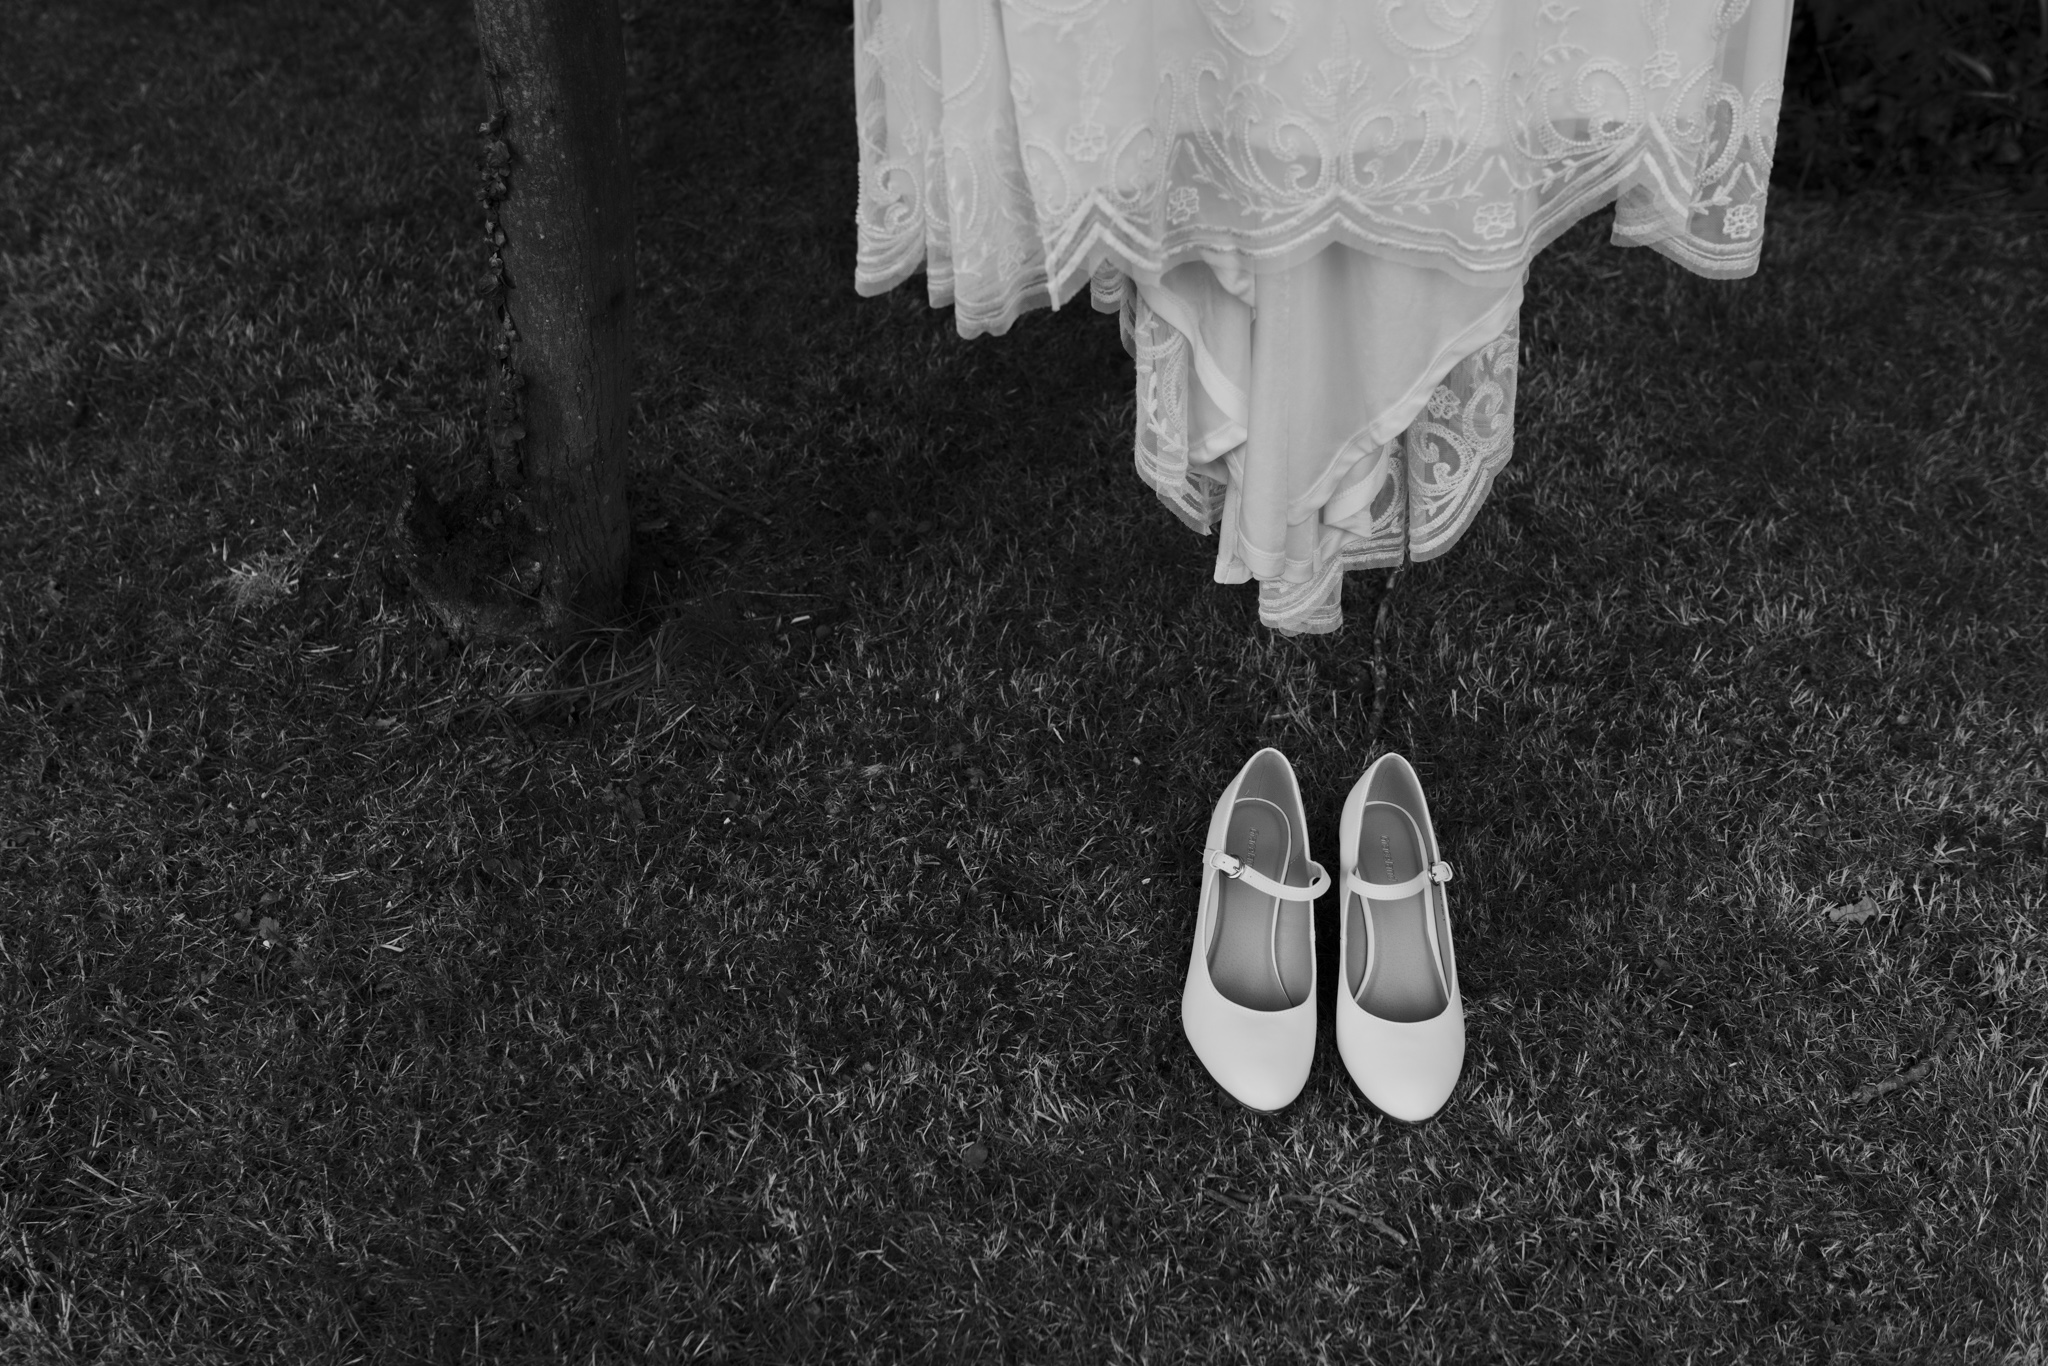 Jess-and-Tom-Norfolk-Alternative-Wedding-Essex-Wedding-Photographer-Grace-Elizabeth-4.jpg